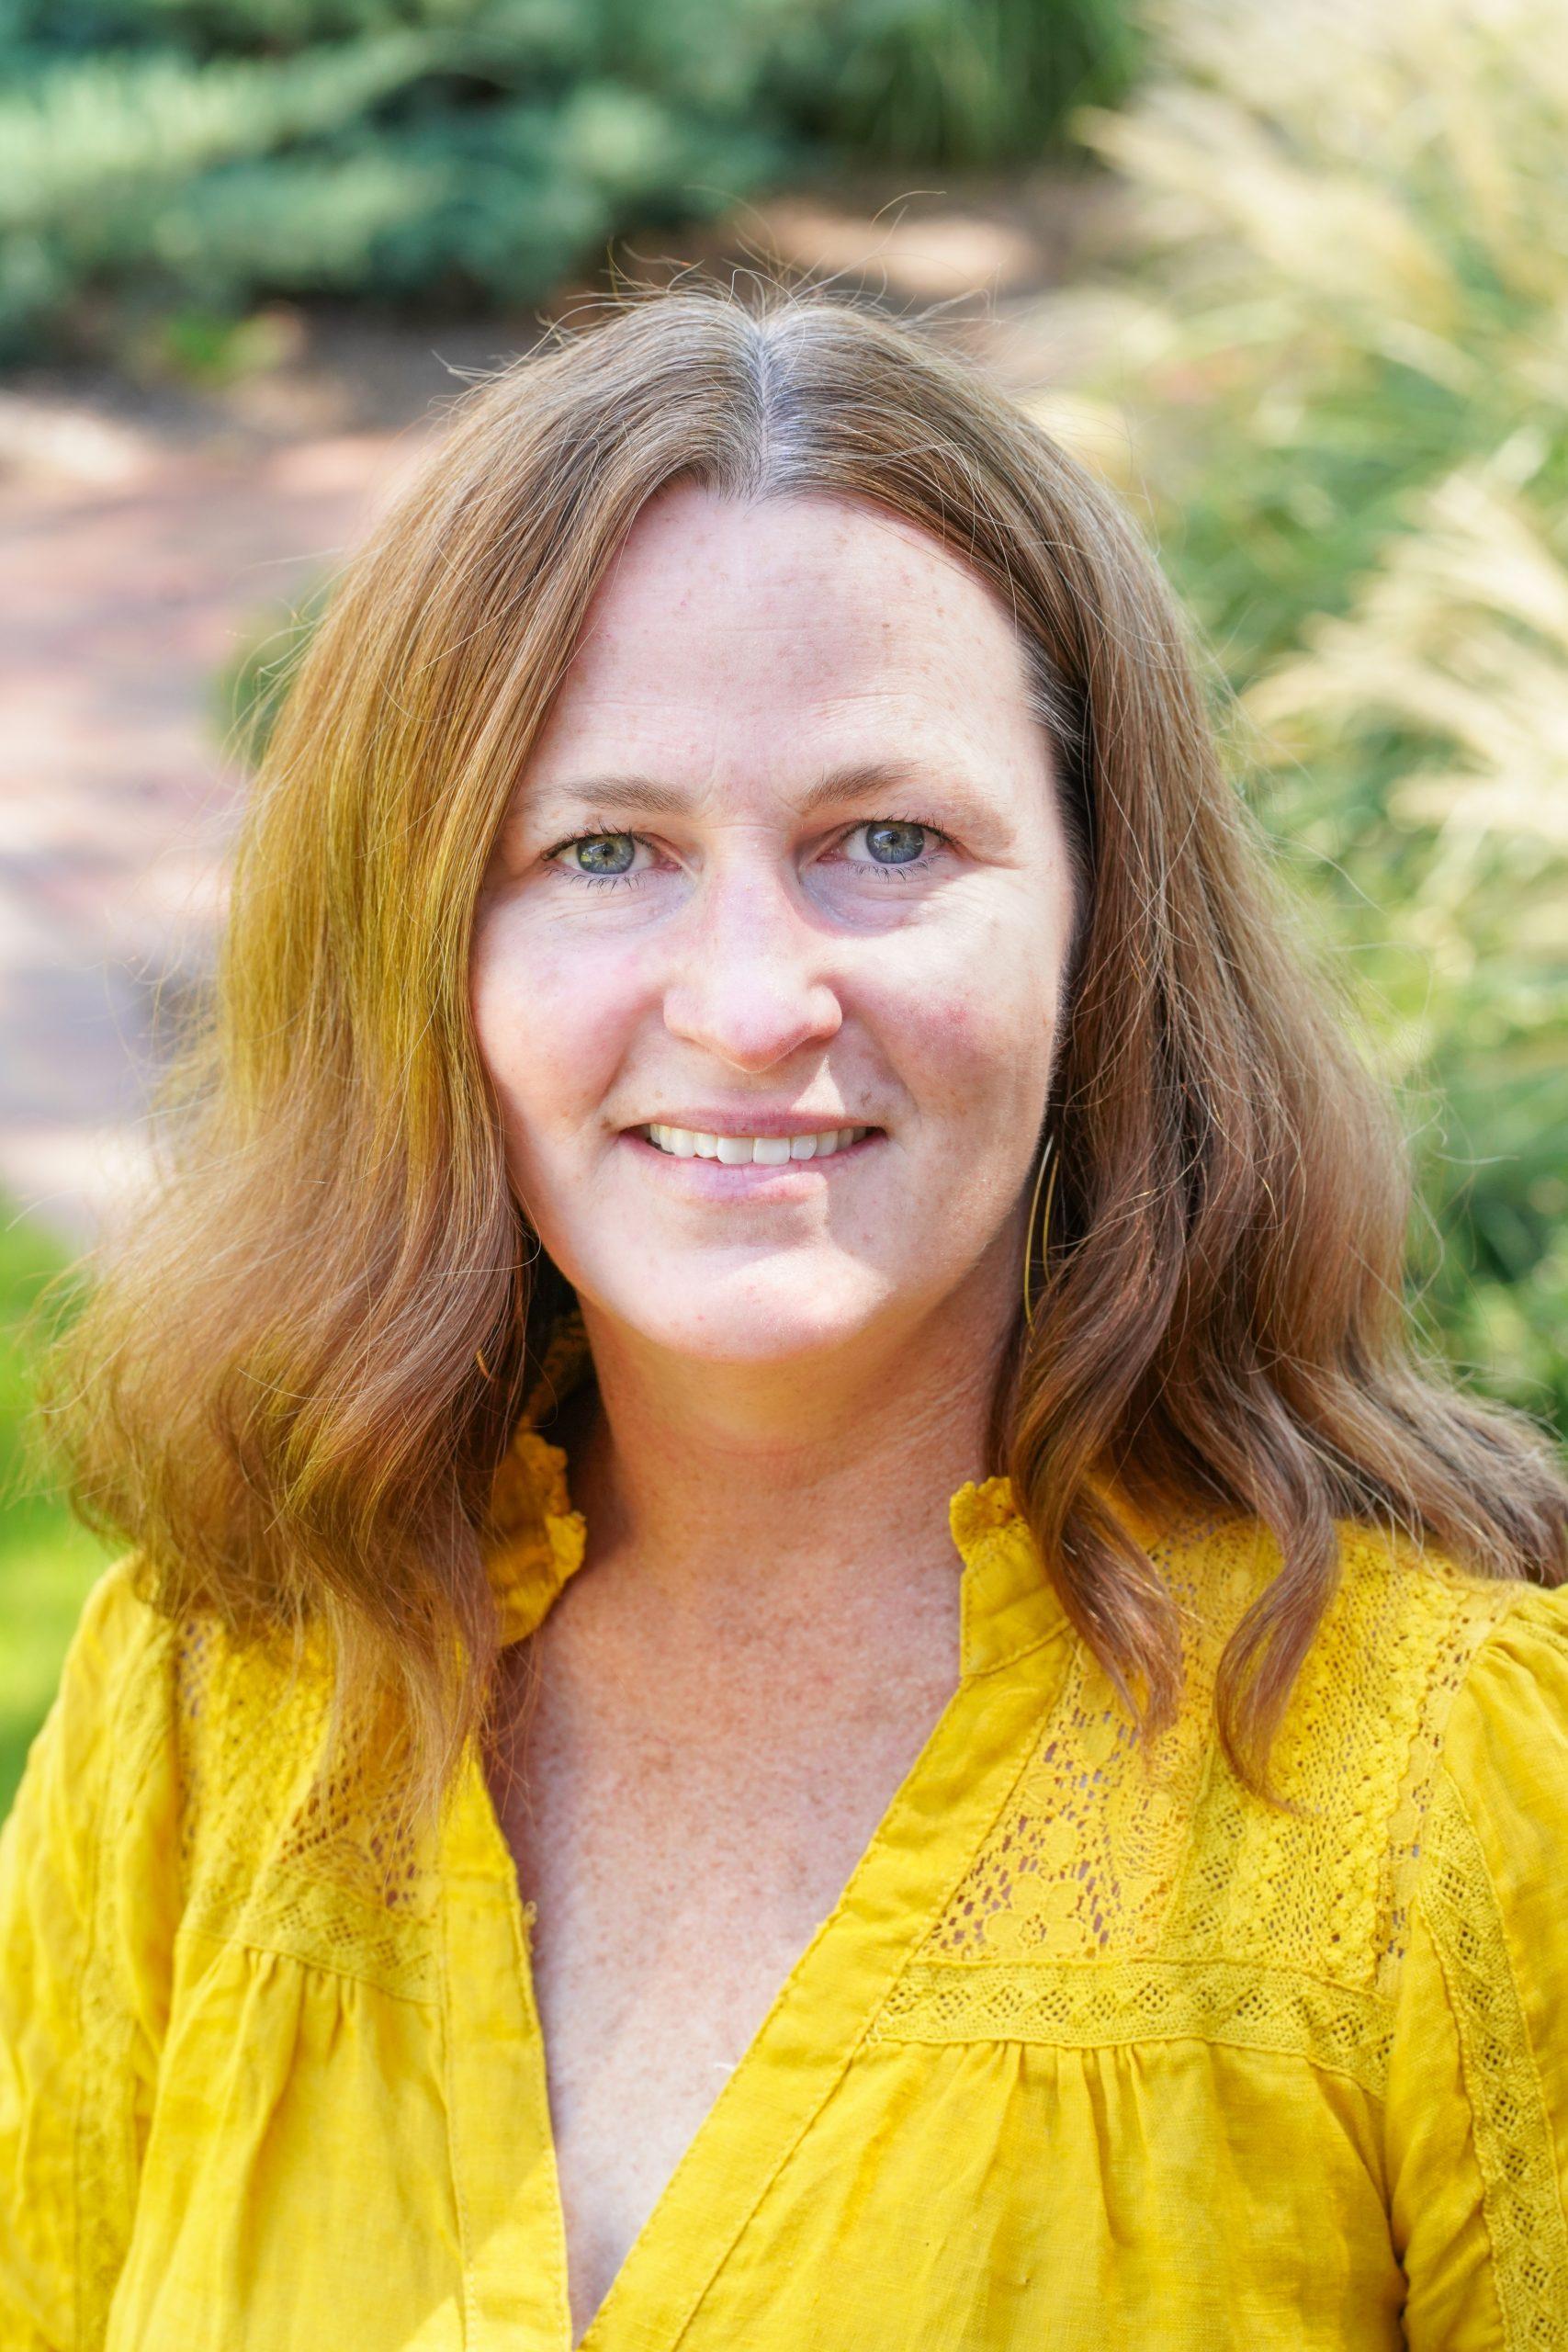 Meredith Tetloff, Ph.D., MSW